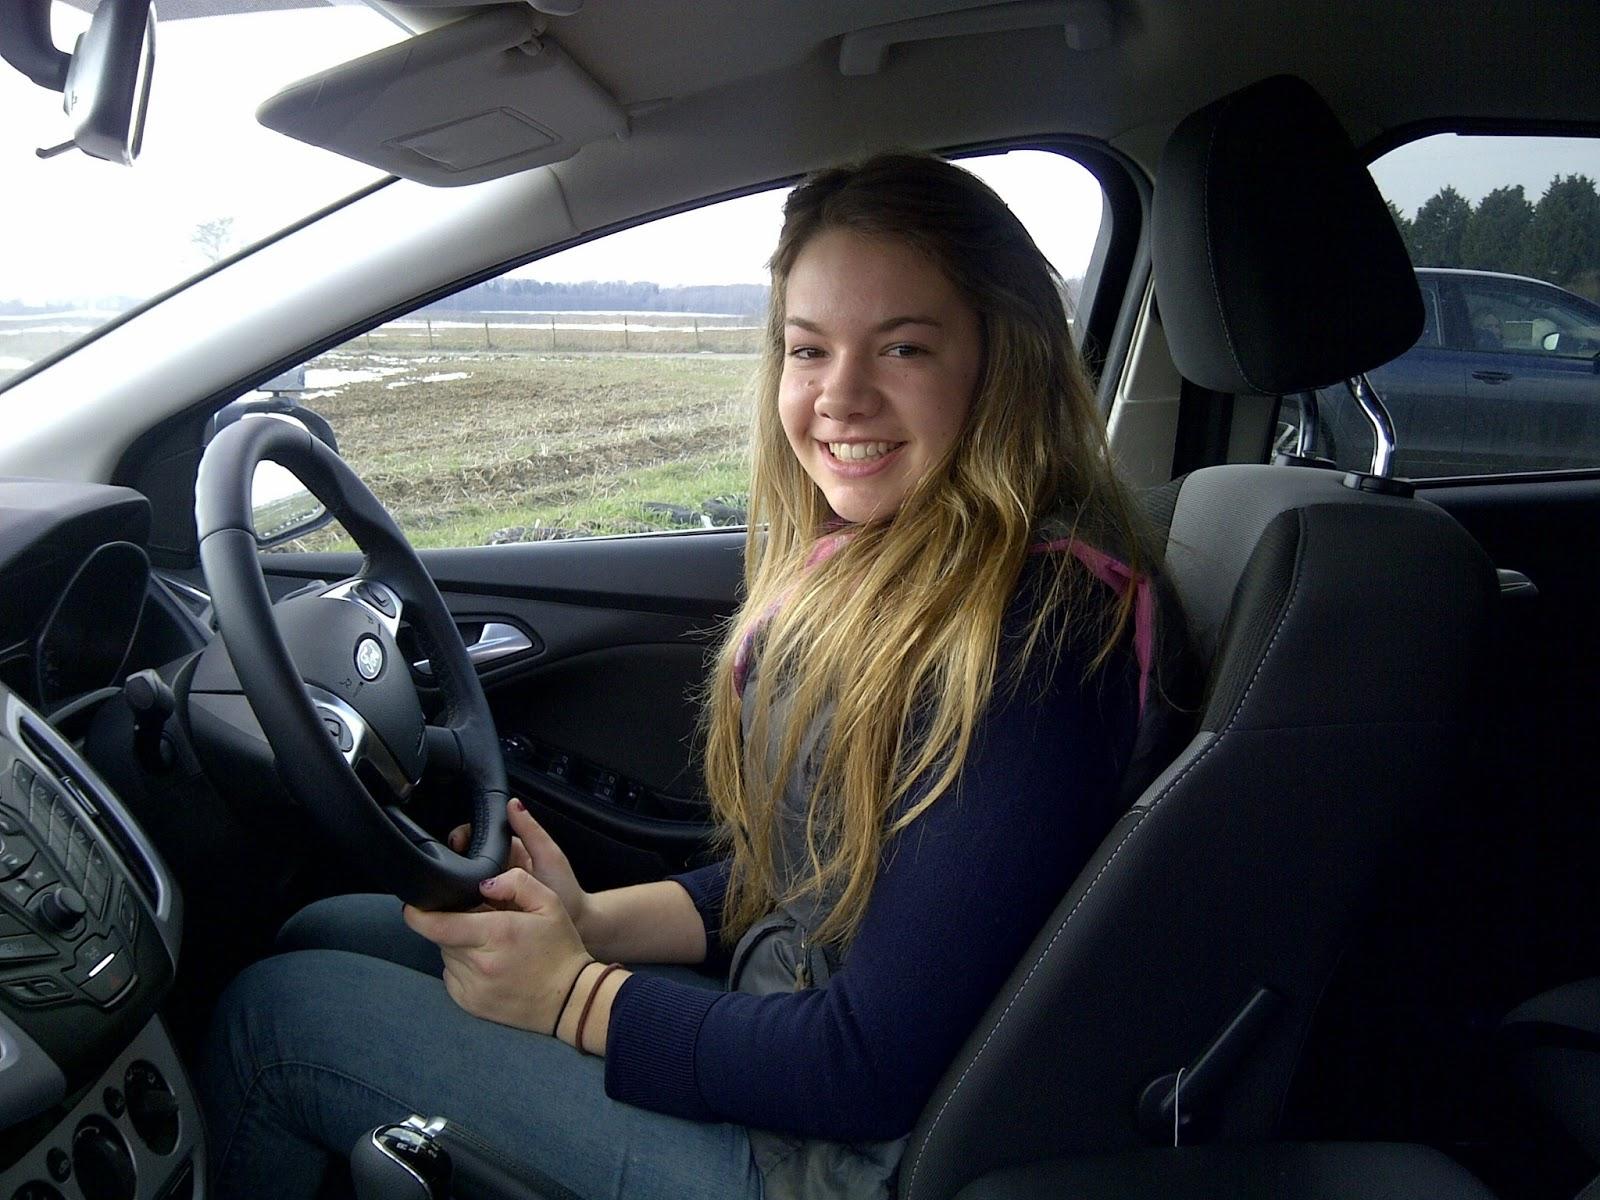 under 17 driving